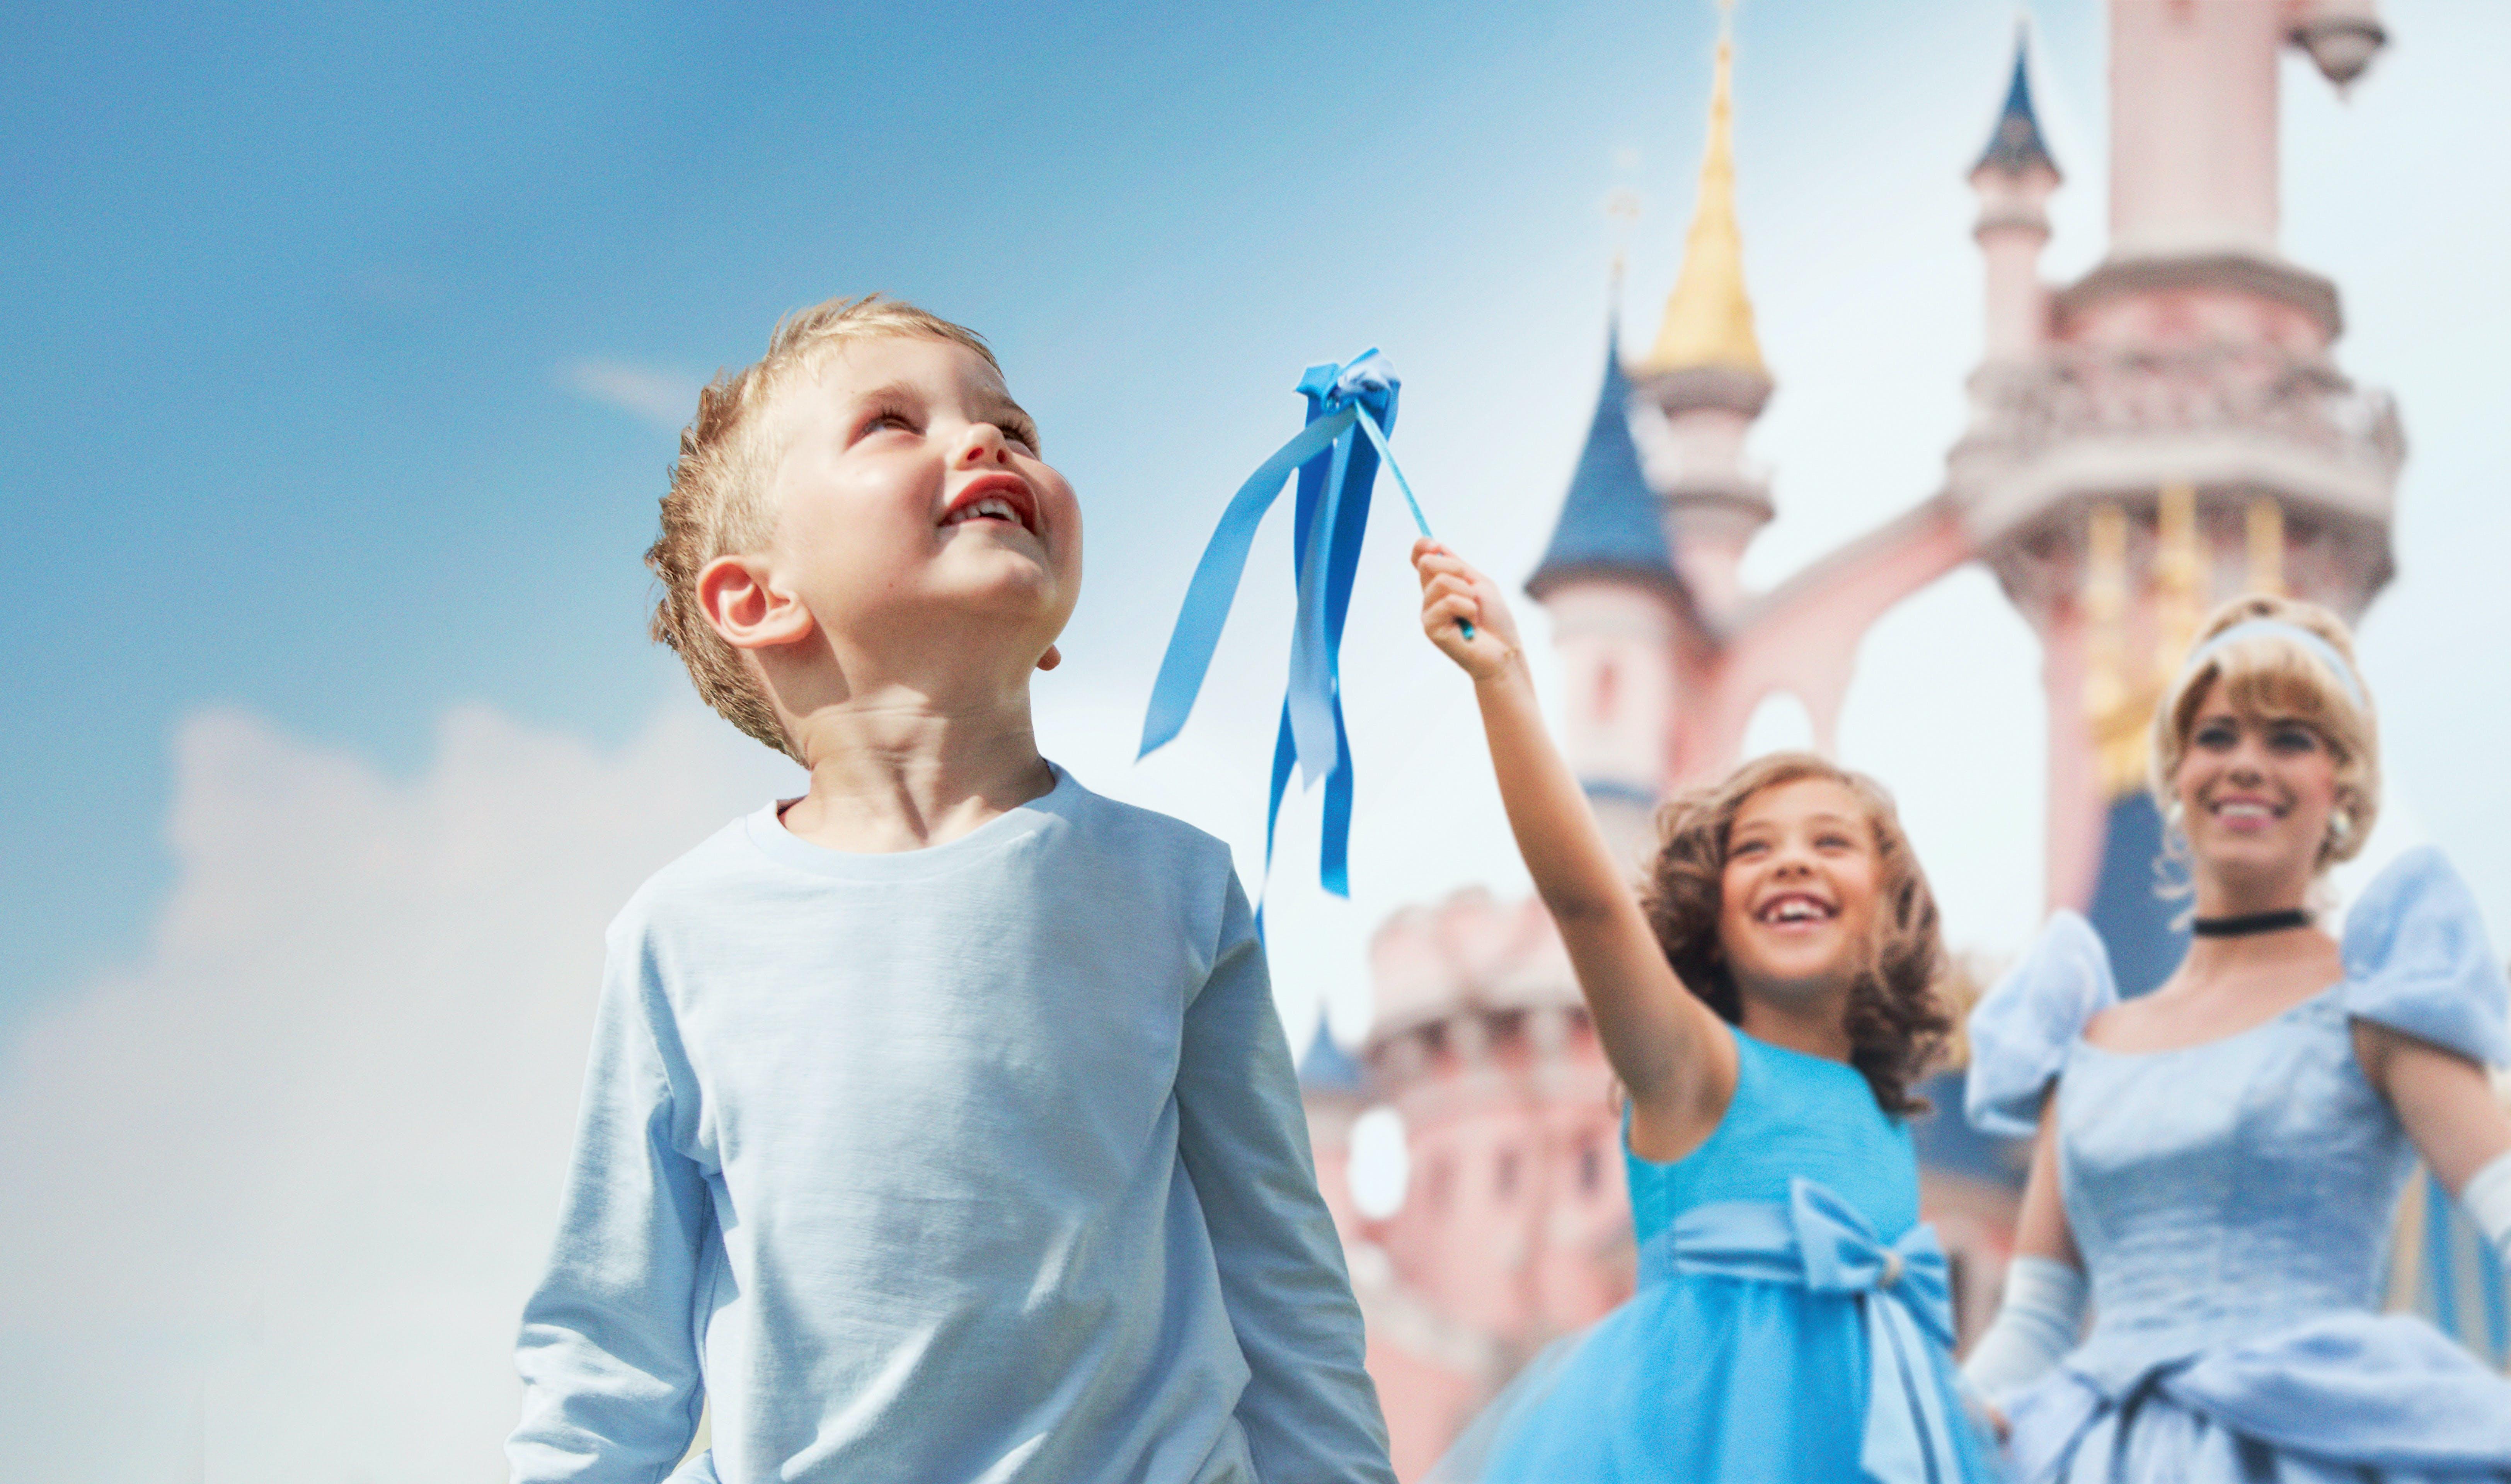 1 Day 1 Park tickets for Disneyland® Paris with round-trip train tickets from Paris